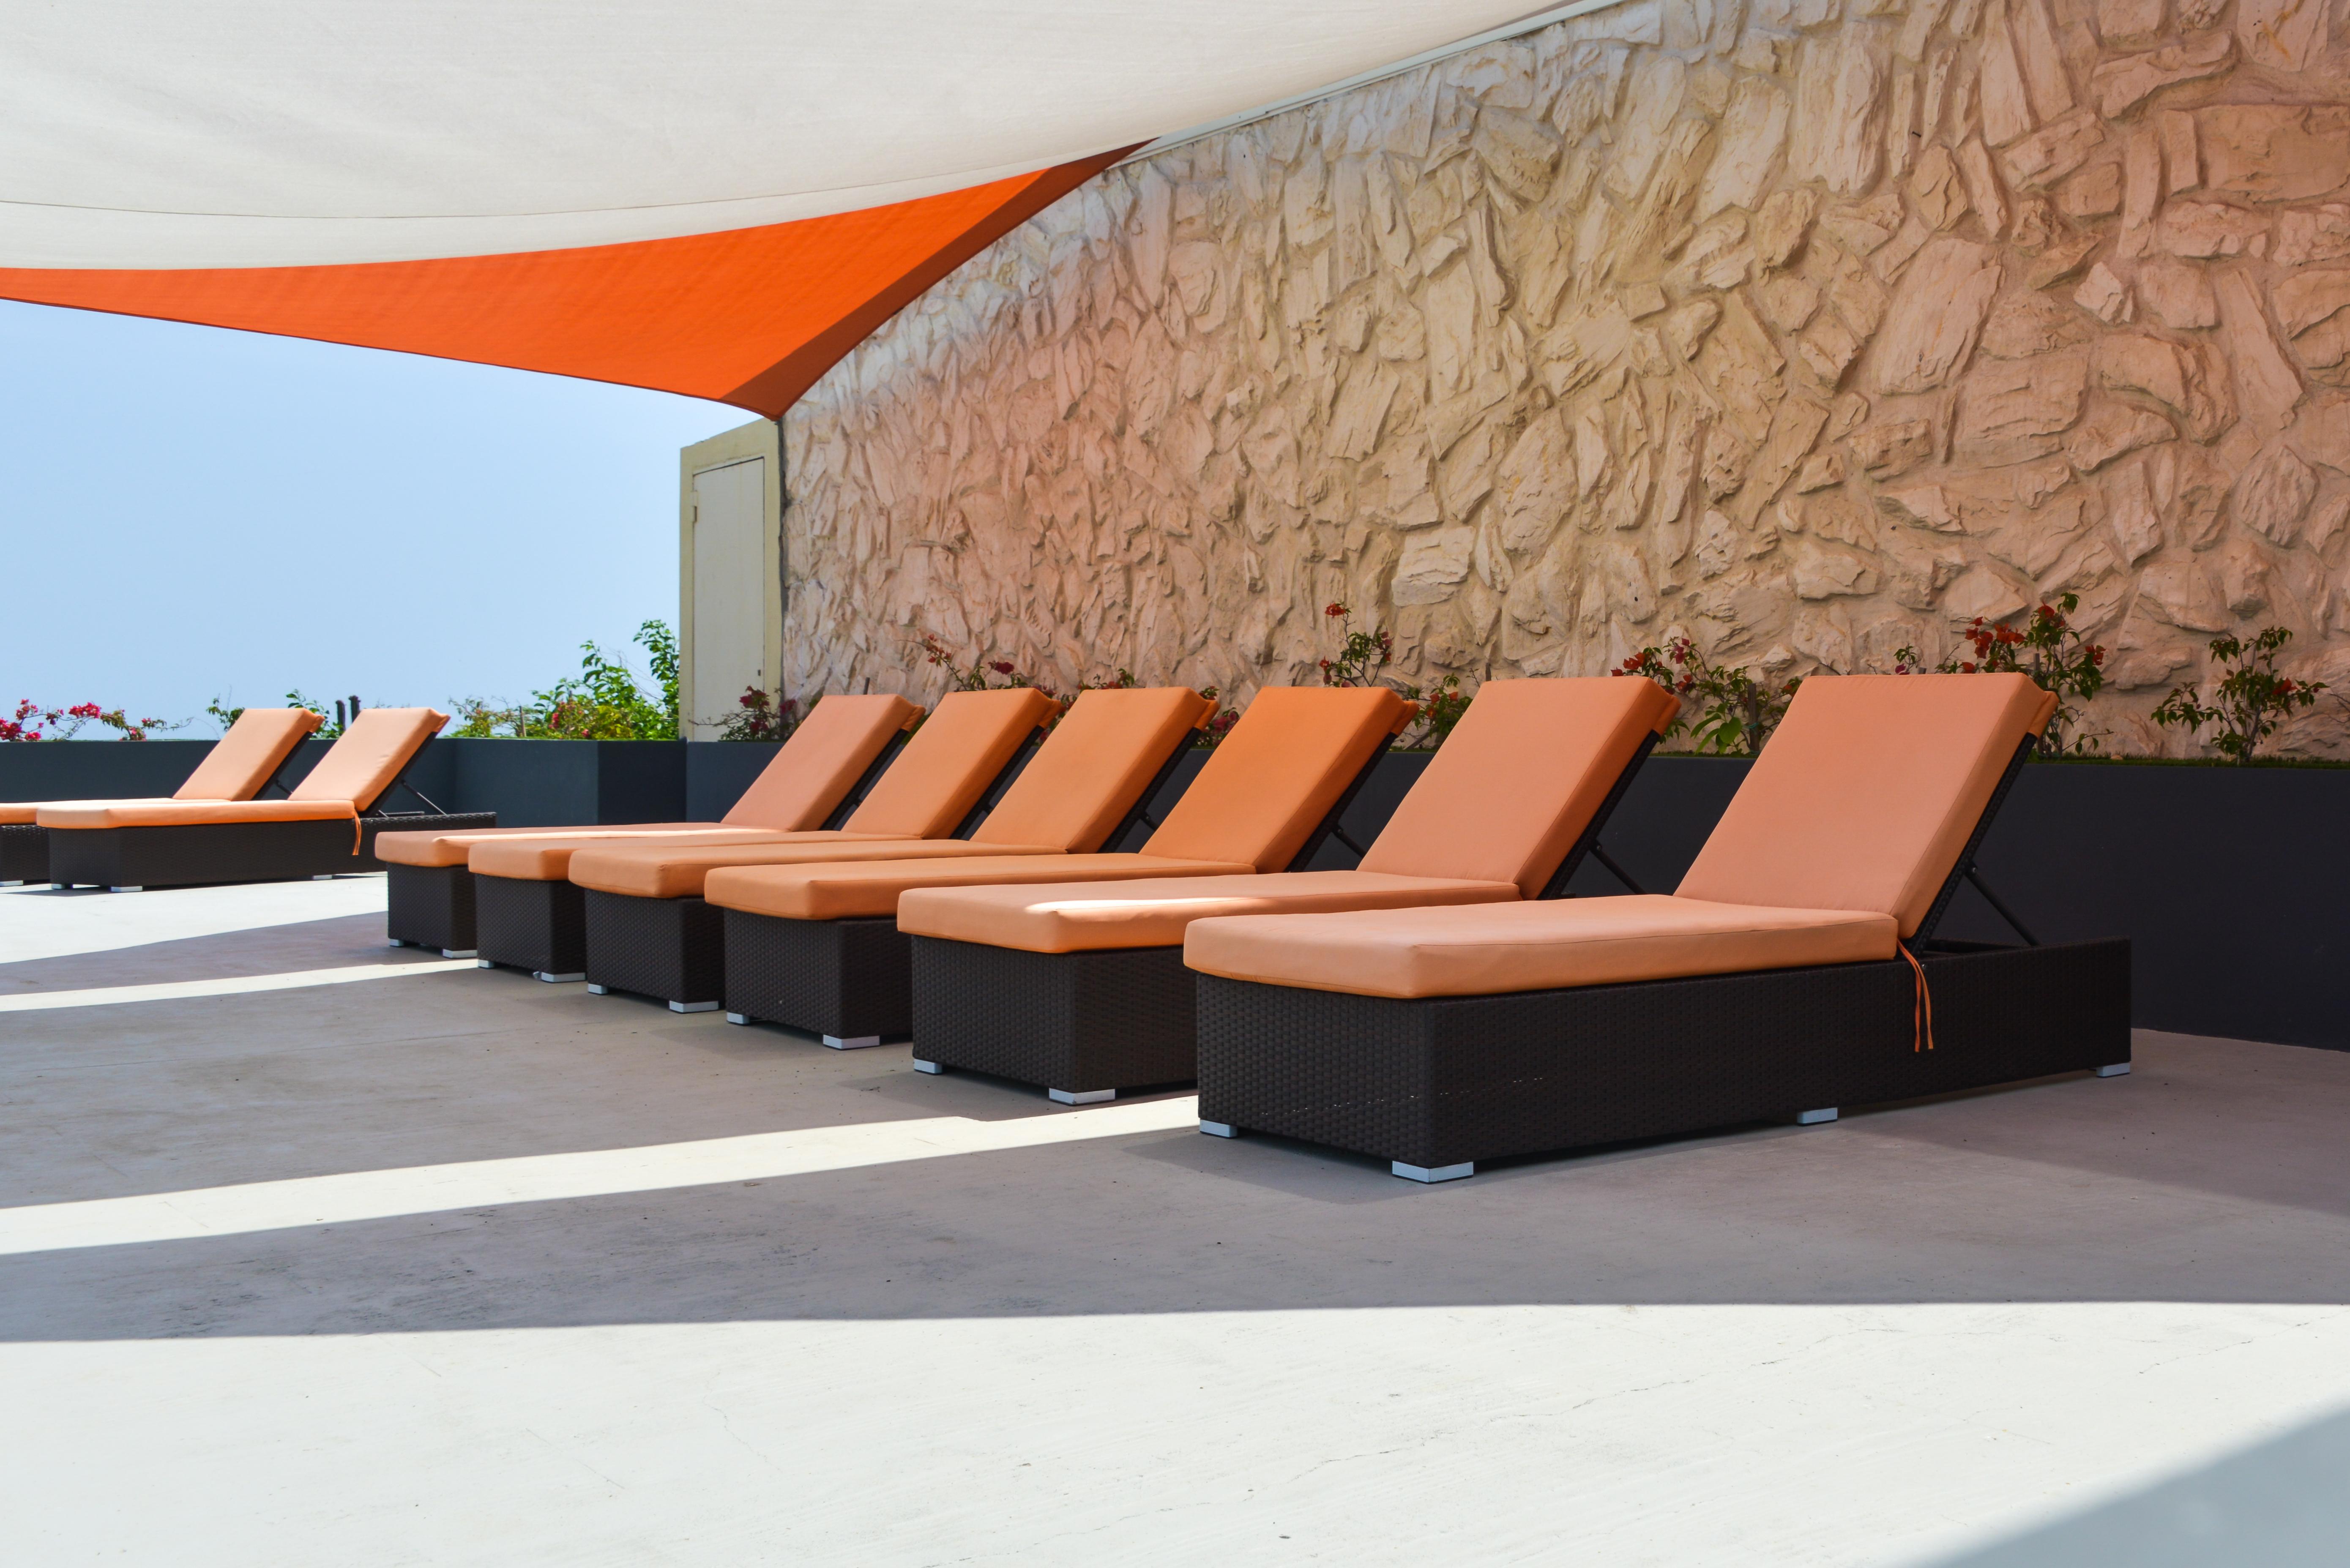 Curacao Airport Hotel Sundeck